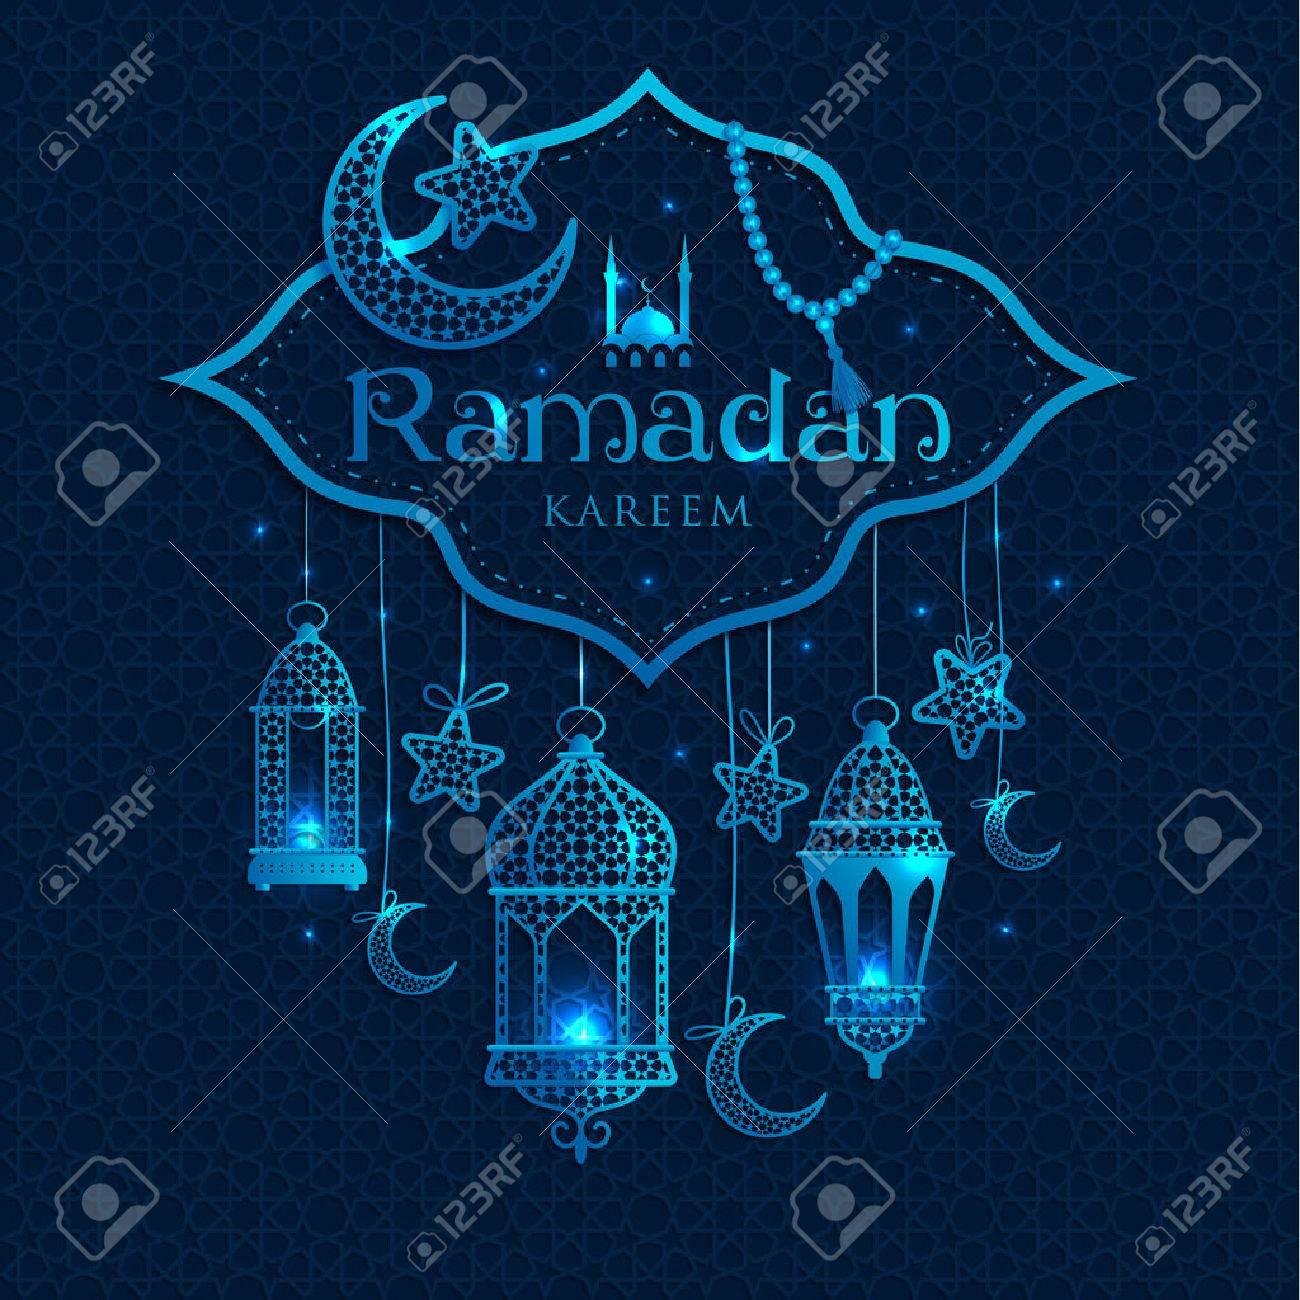 Greeting Card Ramadan Kareem Design With Lamps And Moons Royalty